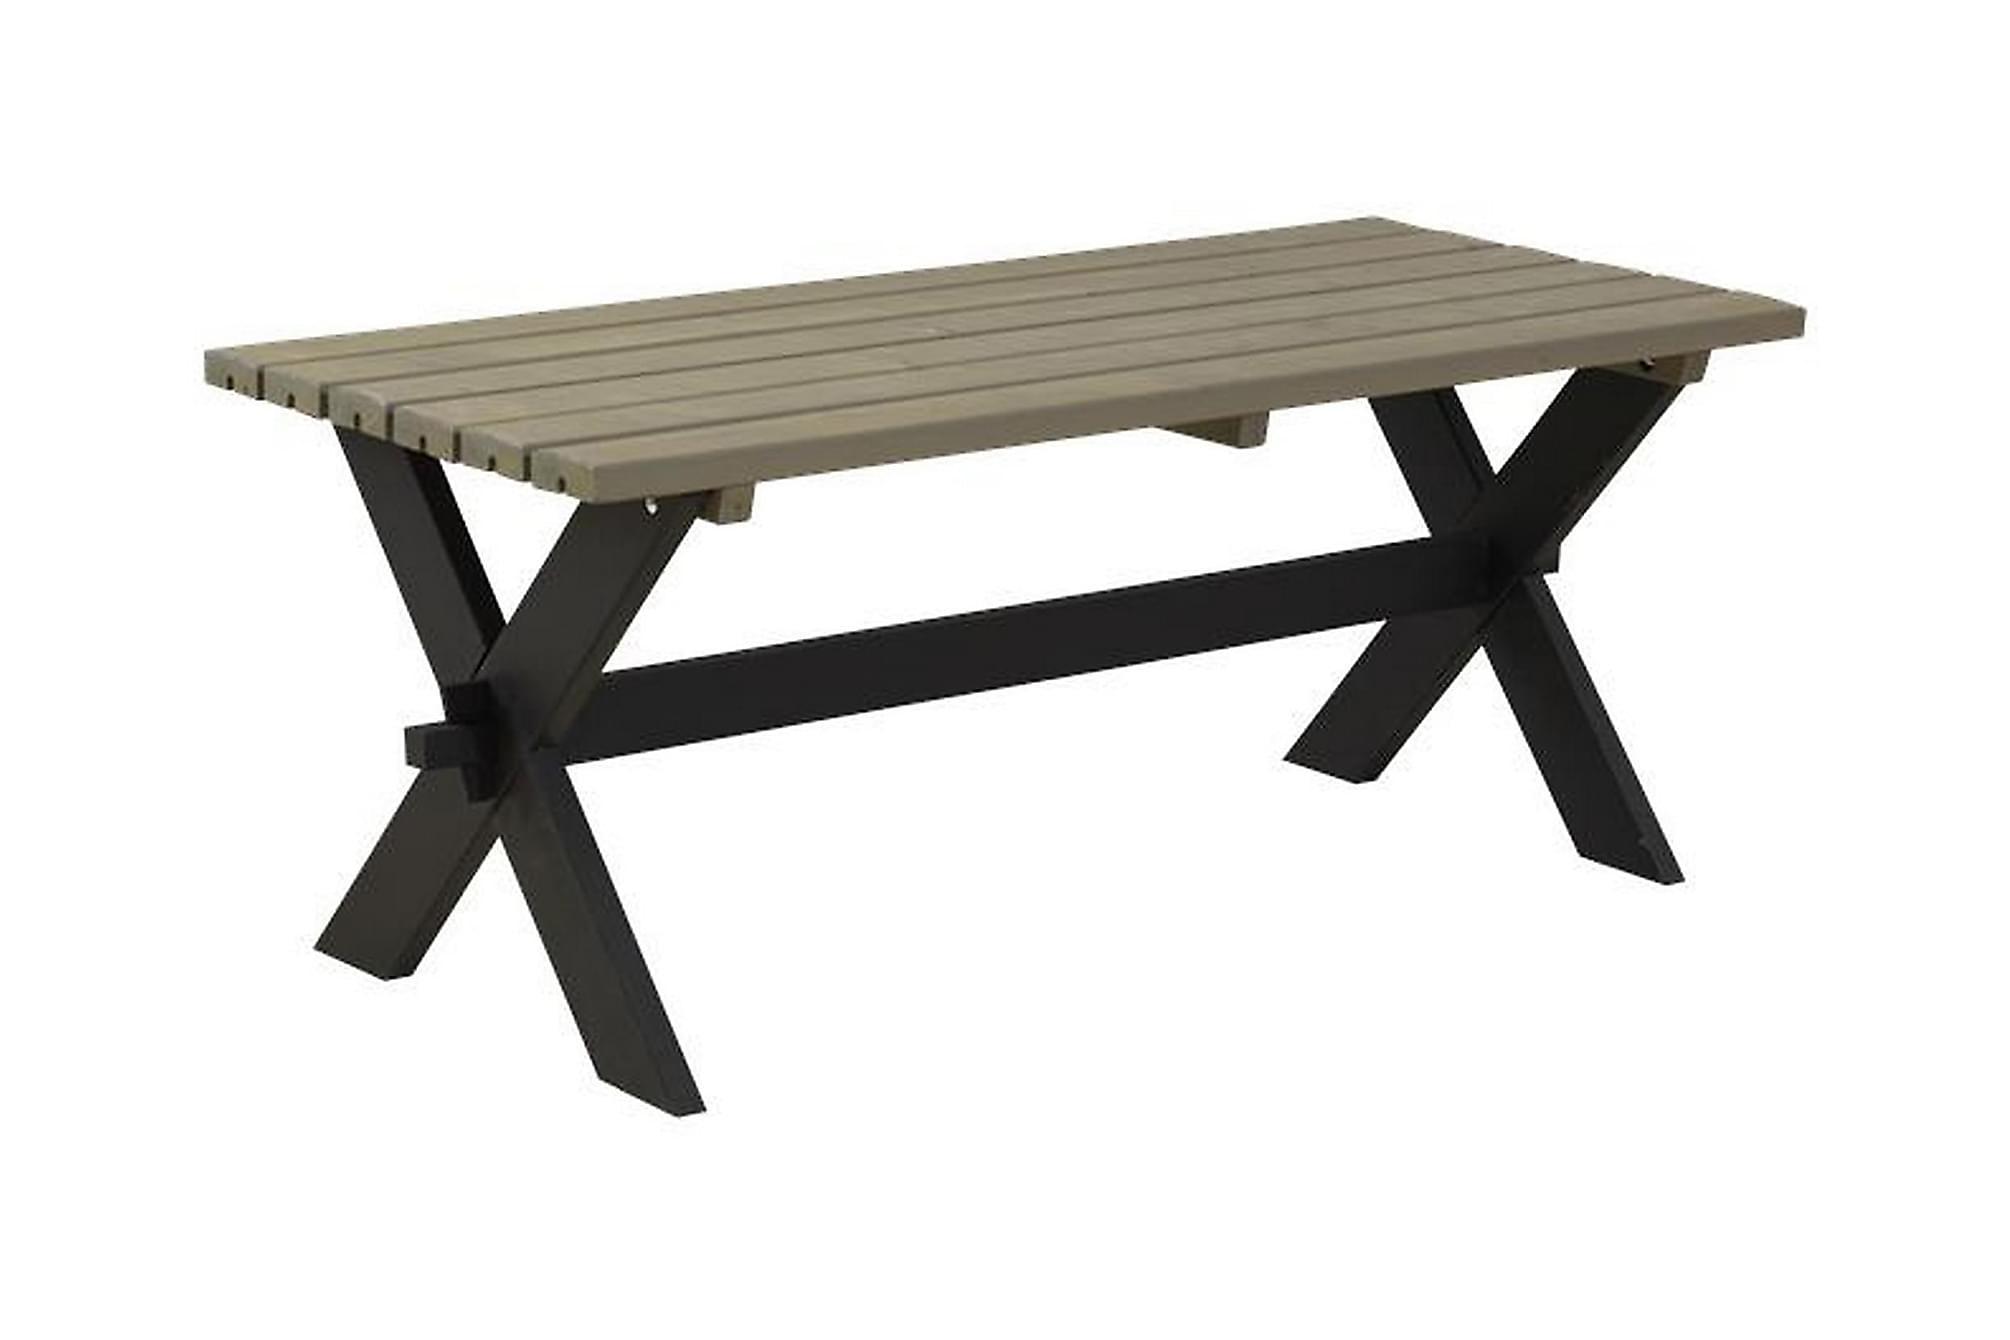 NOSTALGI Plankbord 177x76 Svart/Grå, Träbord